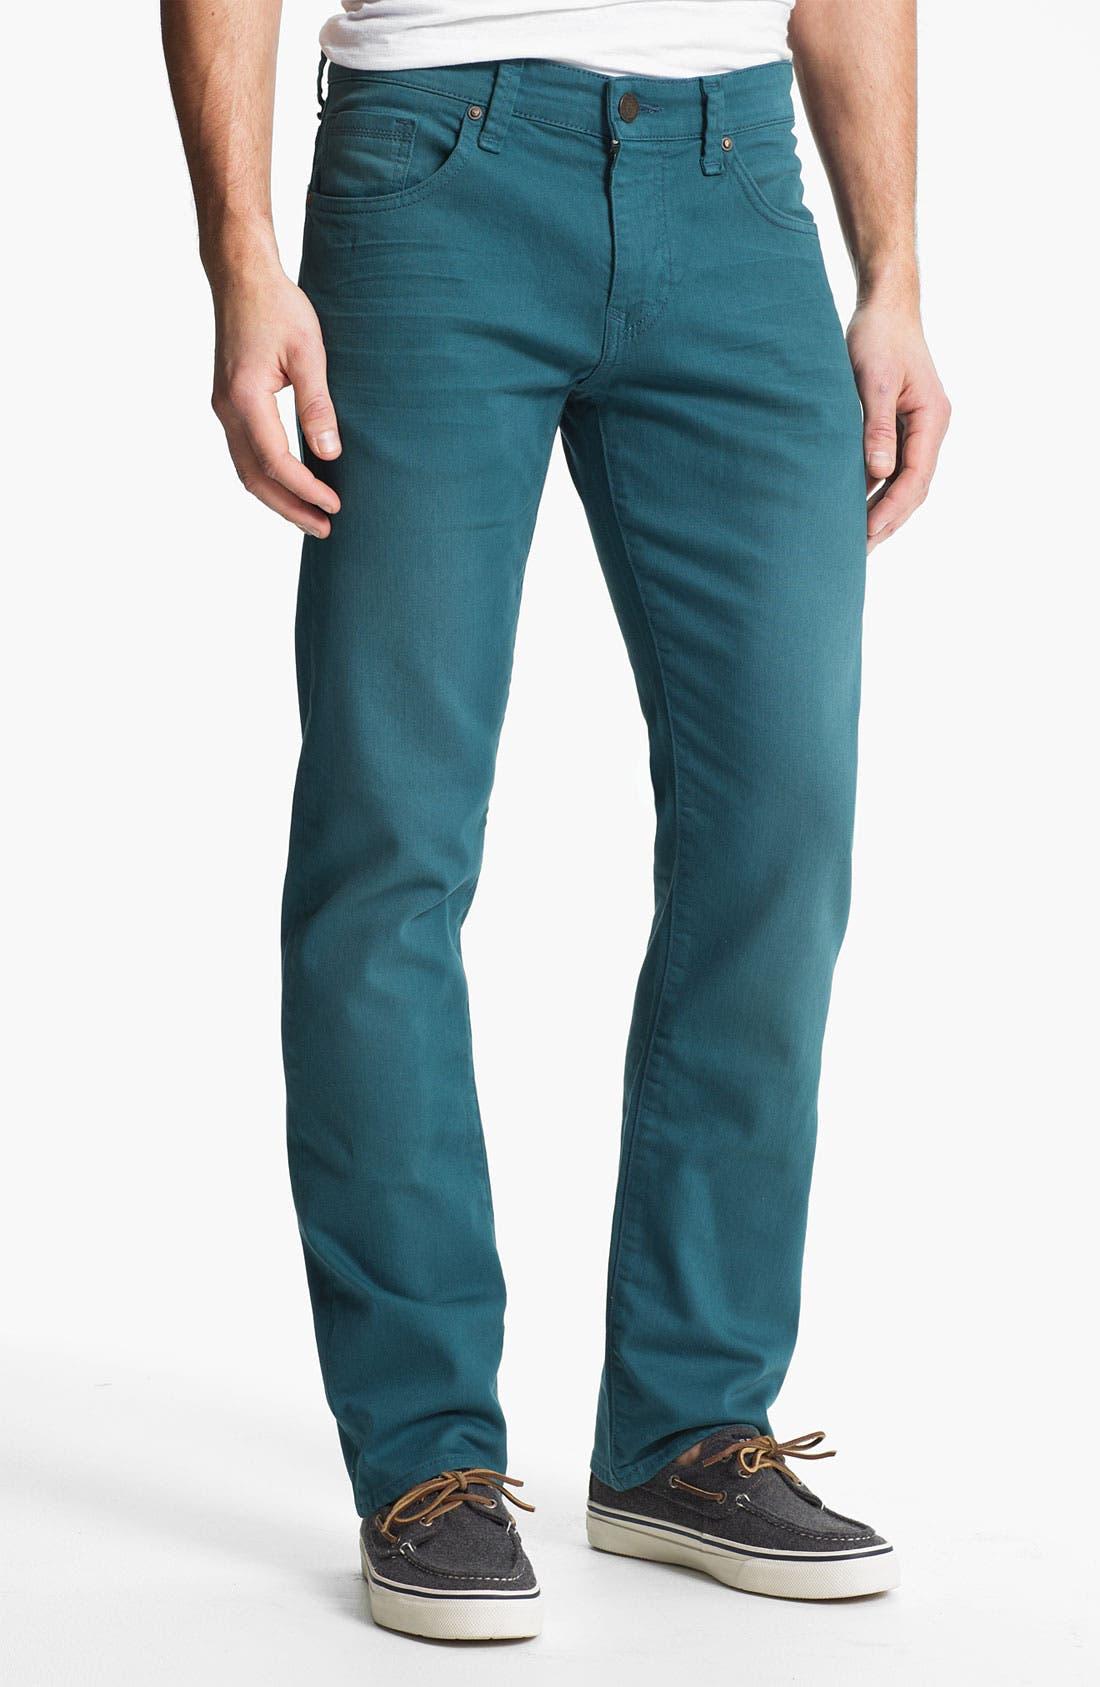 Alternate Image 2  - Mavi Jeans 'Zach' Straight Leg Jeans (Teal)